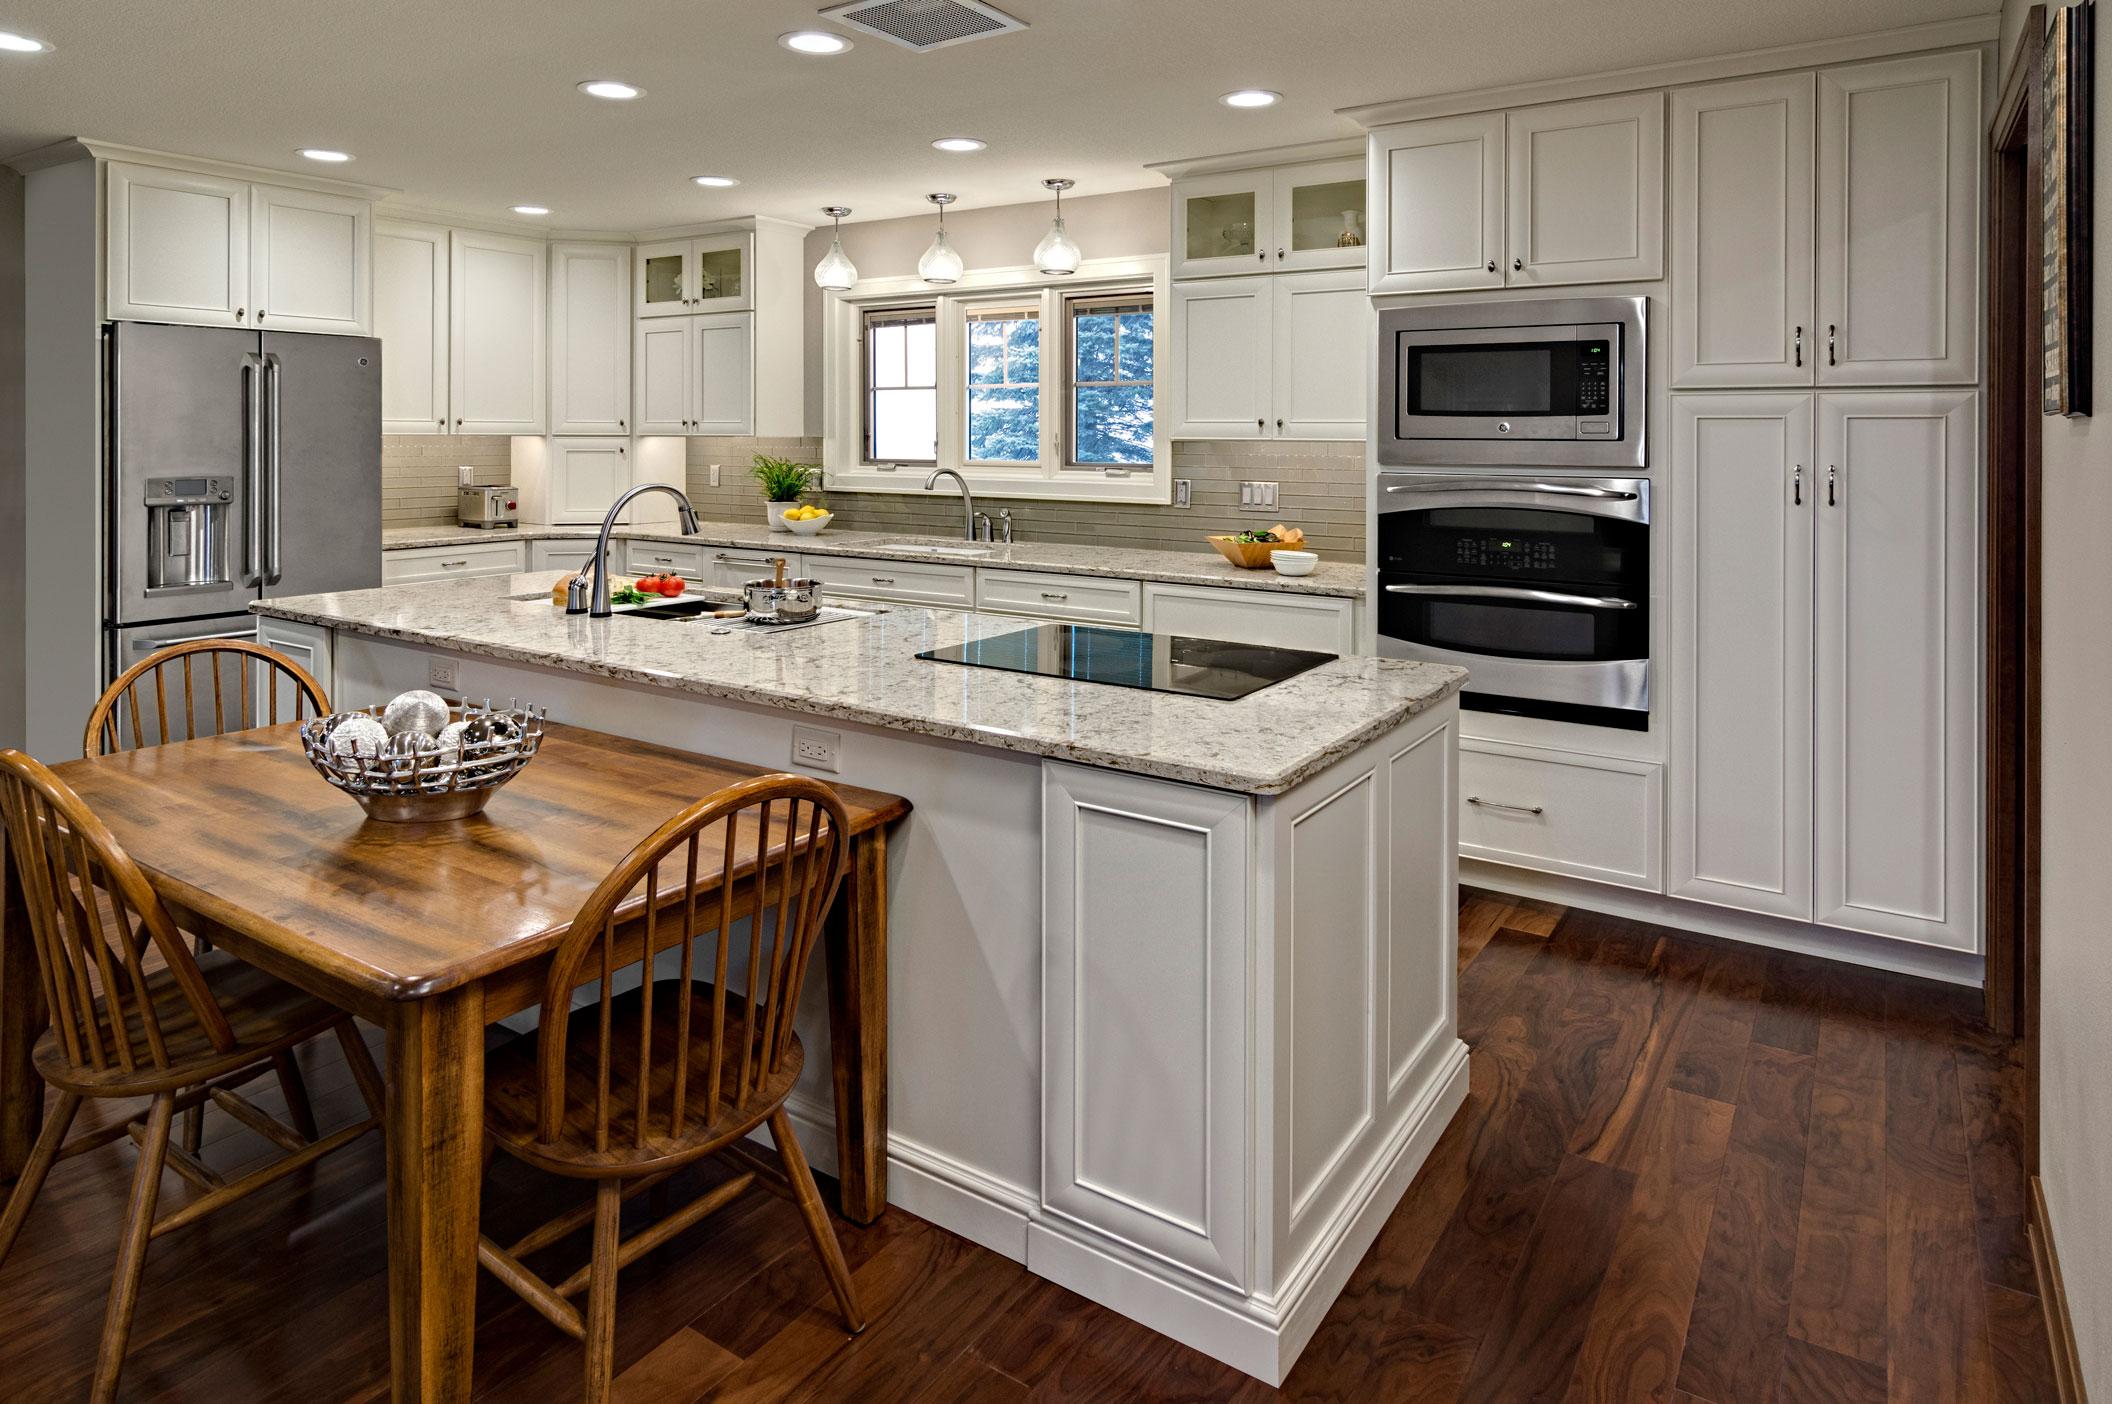 Thompson-kitchen-fridge-2.jpg